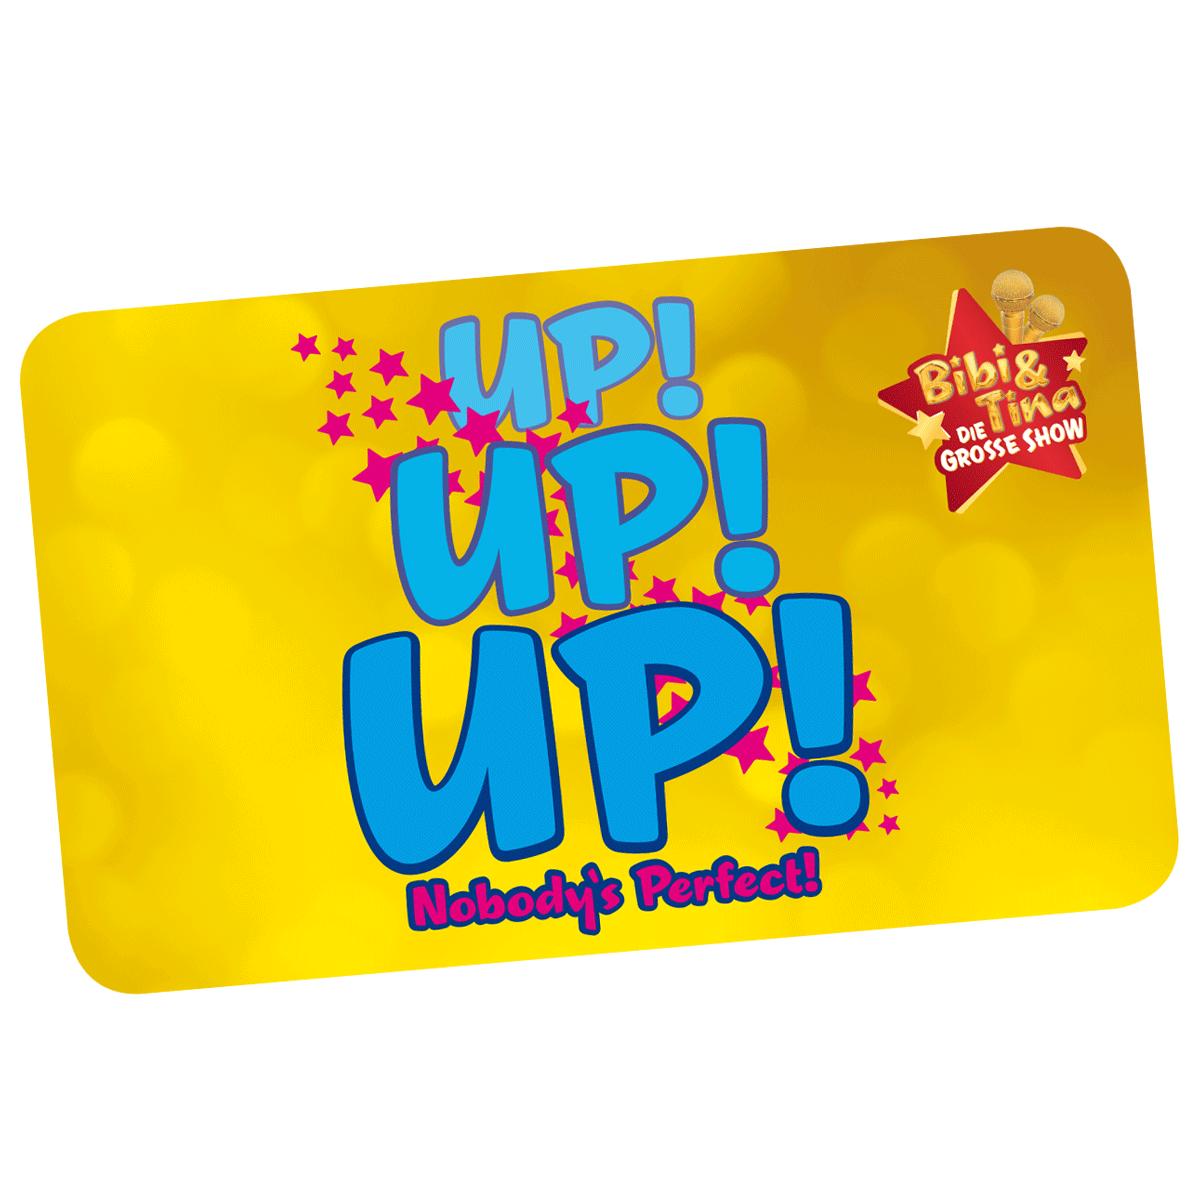 Bibi&Tina Up! Up! Up! Breakfast board